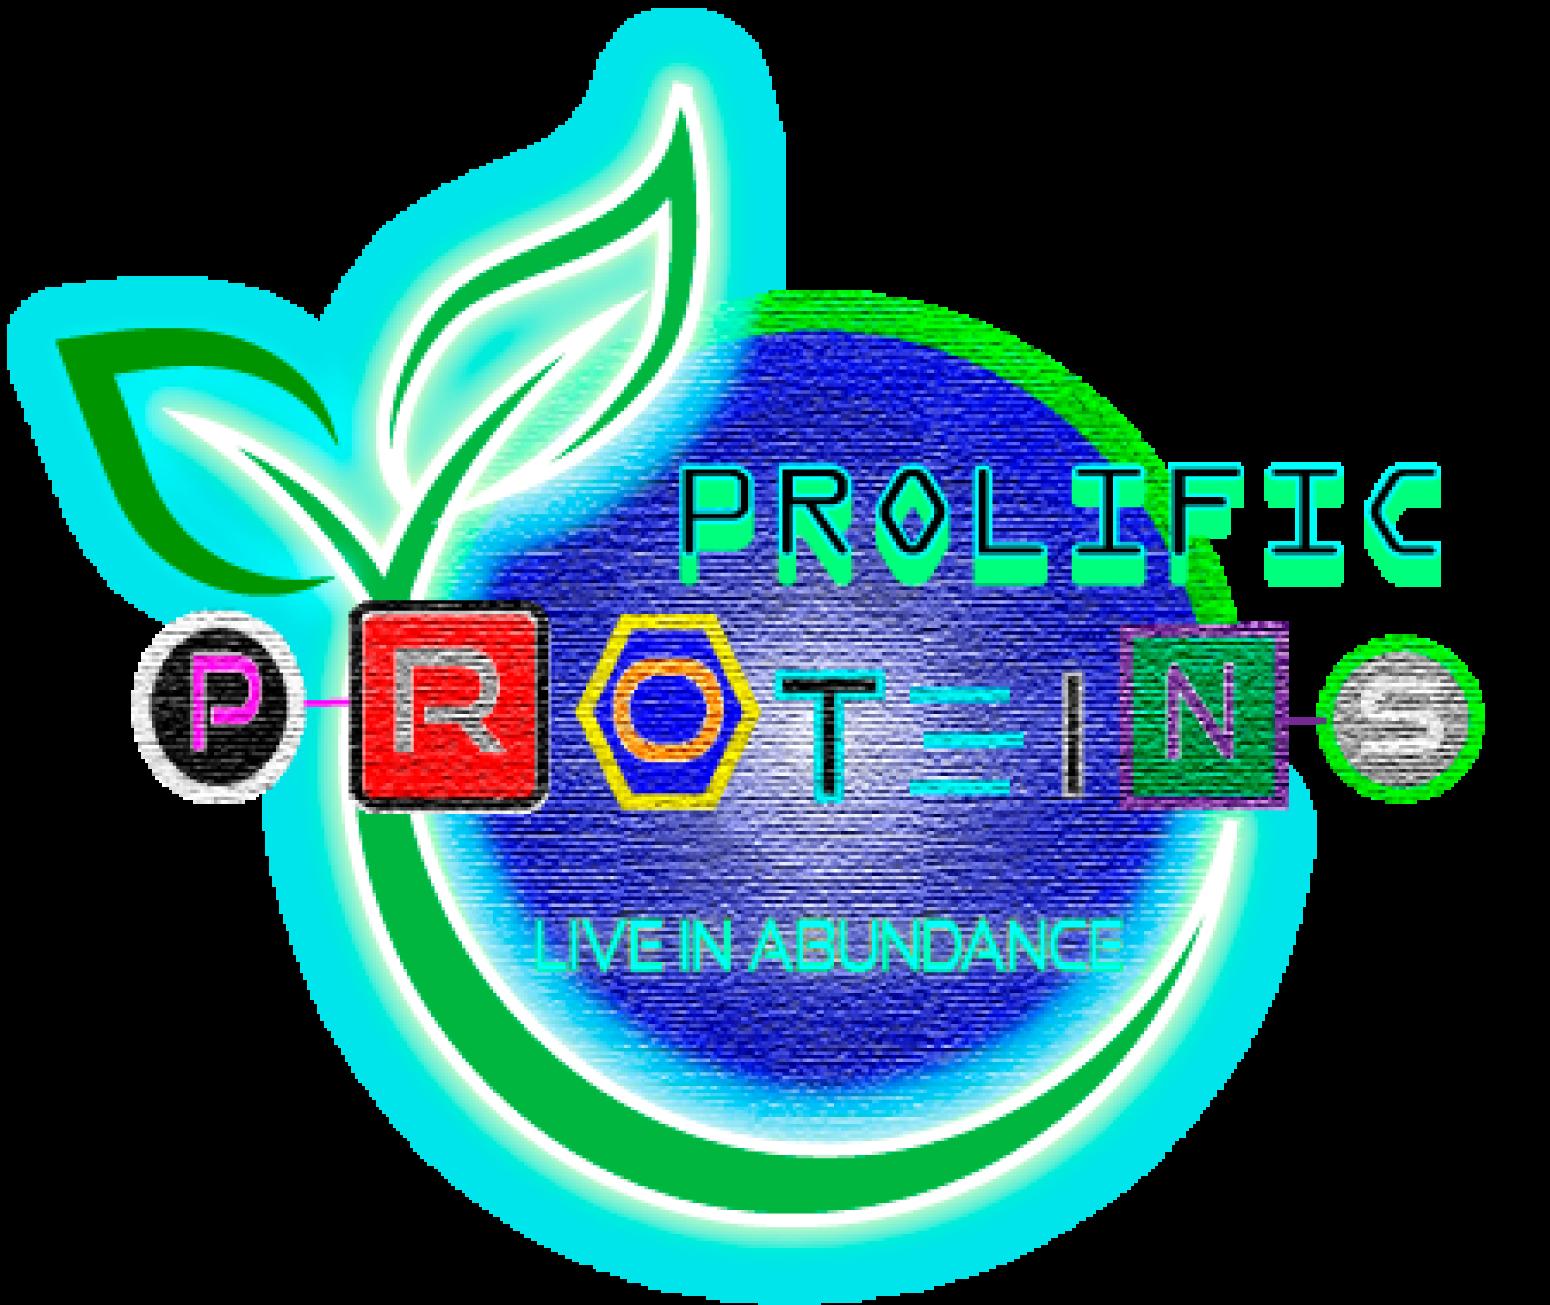 Prolific Proteins